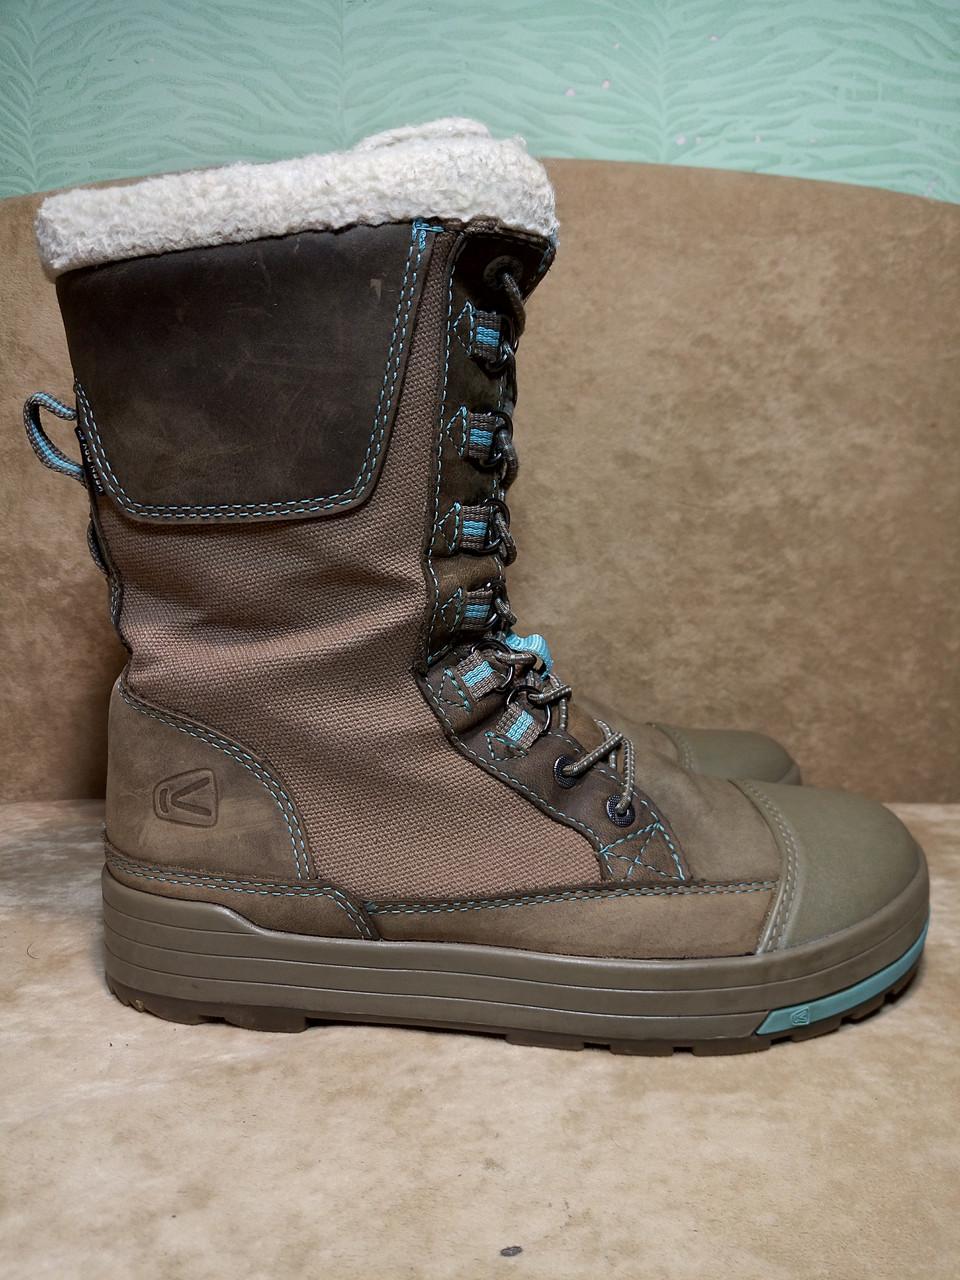 Зимние сапоги ботинки Keen Snow Rover термоботинки. Оригинал. 39 р. 25 см ffc4f54396e58